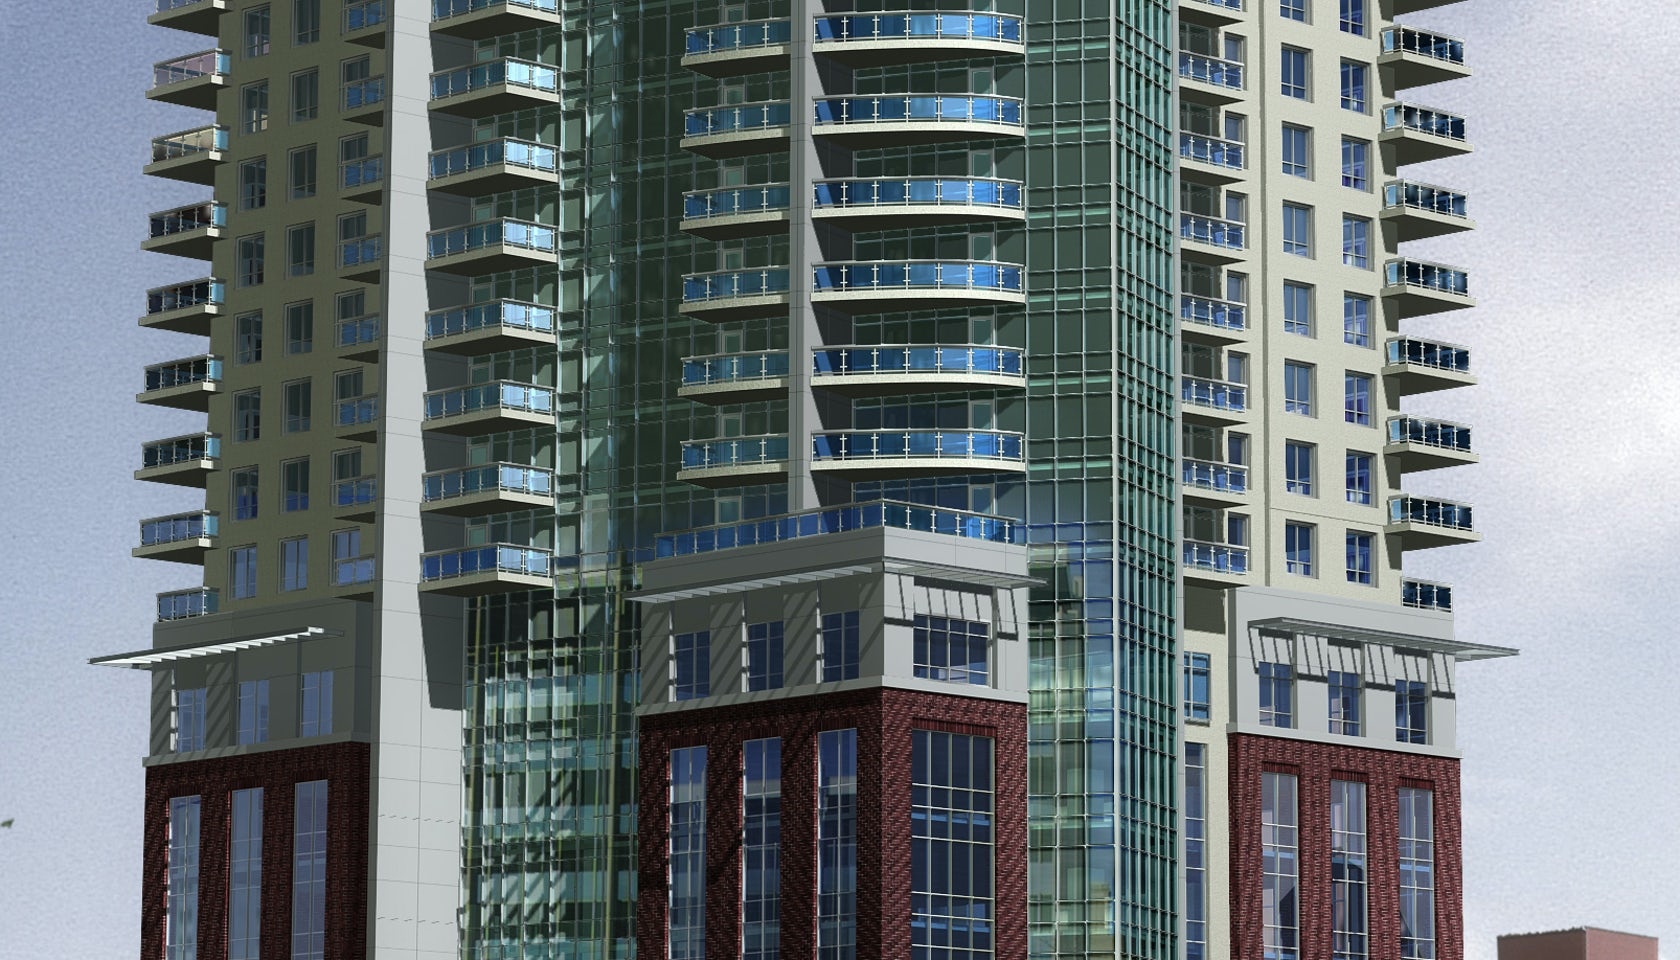 Abugov kaspar architecture urban design engineering for Architecture and engineering firms